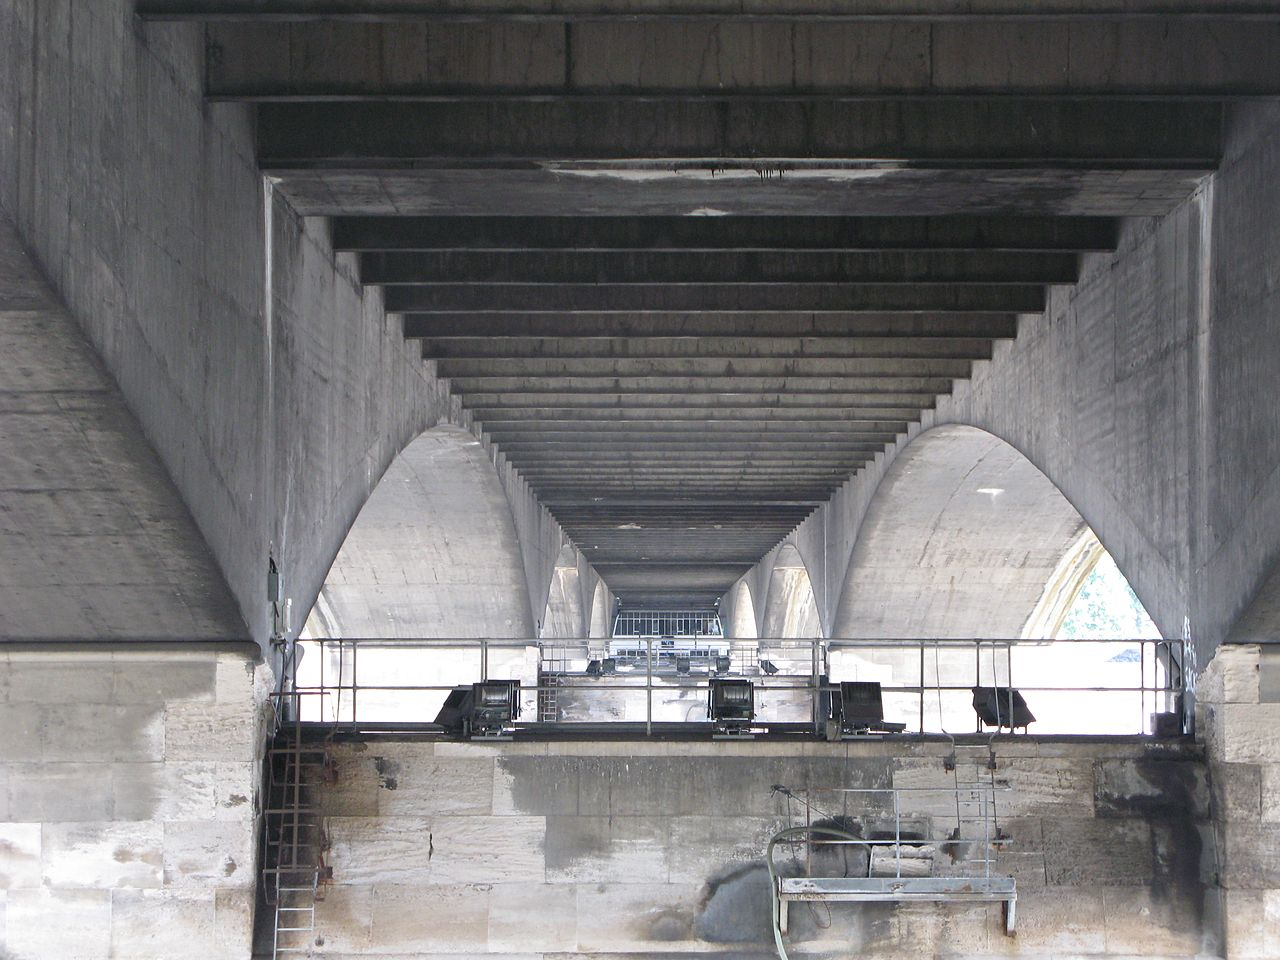 1280px-Underside_Waterloo_Bridge